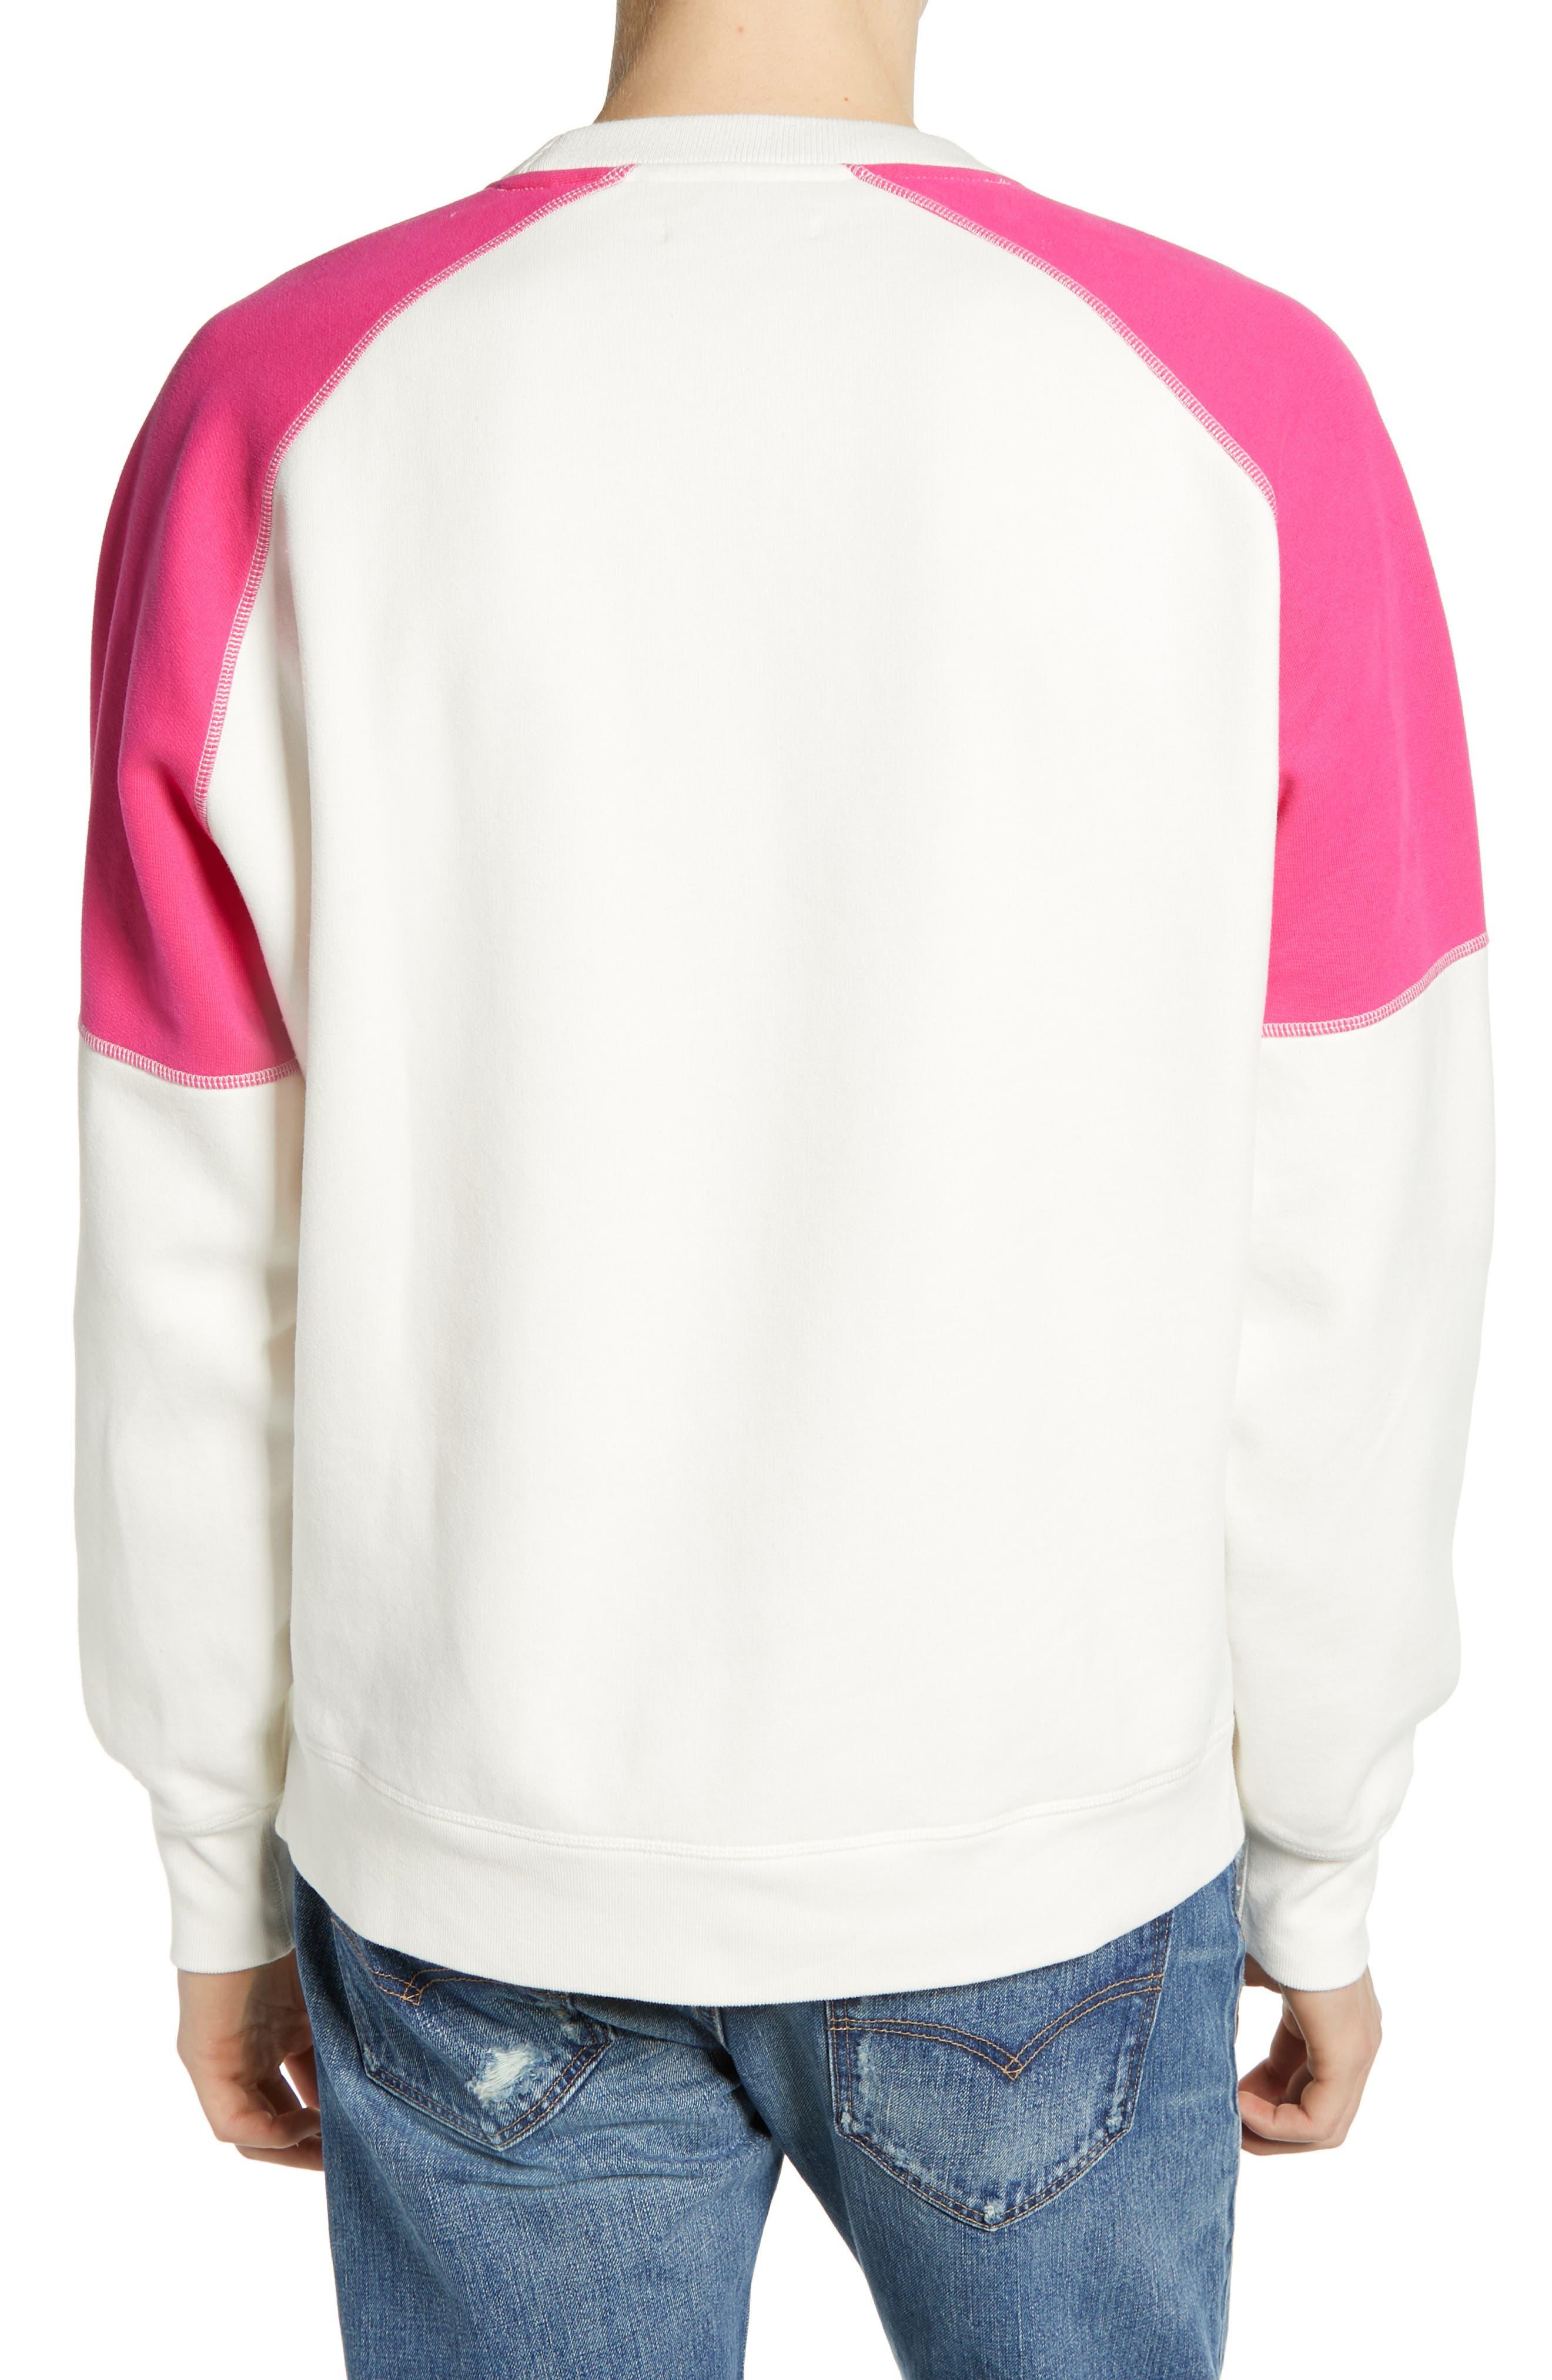 LEVI'S<SUP>®</SUP> MADE & CRAFTED<SUP>™</SUP>, Regular Fit Raglan Sweatshirt, Alternate thumbnail 2, color, WHITE ALYSSUM